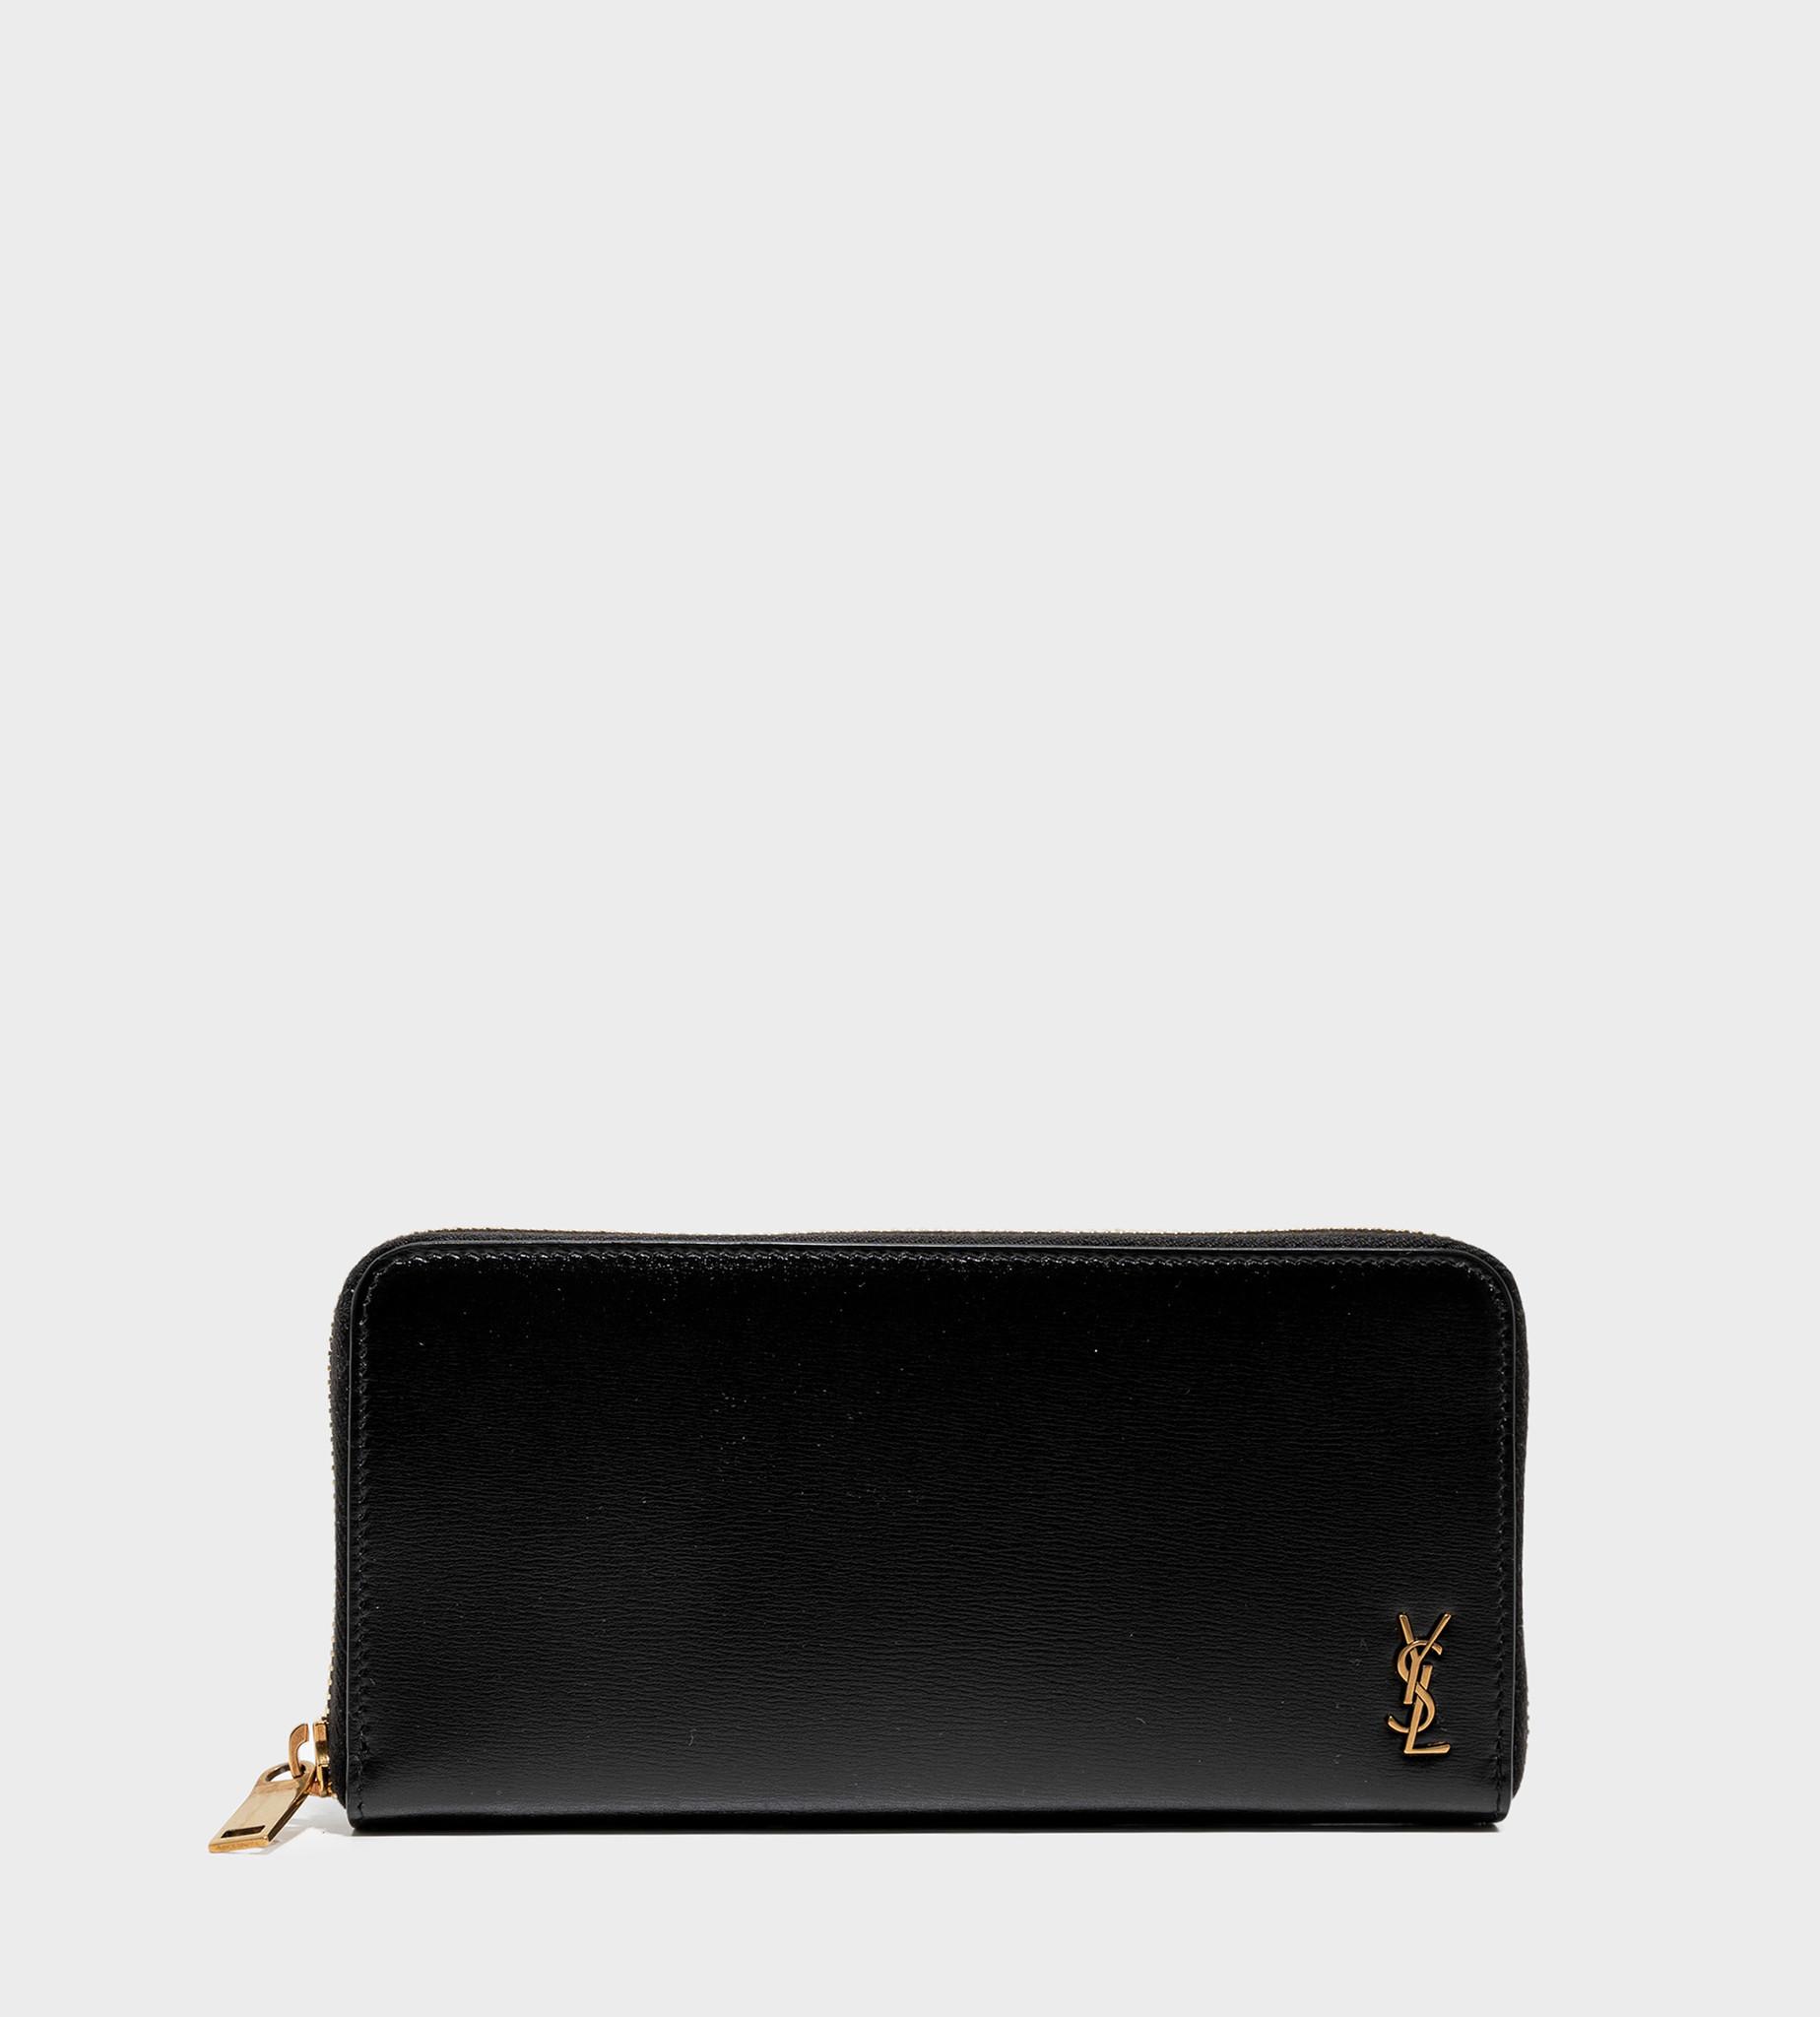 SAINT LAURENT Zip-Around Wallet In Smooth Leather